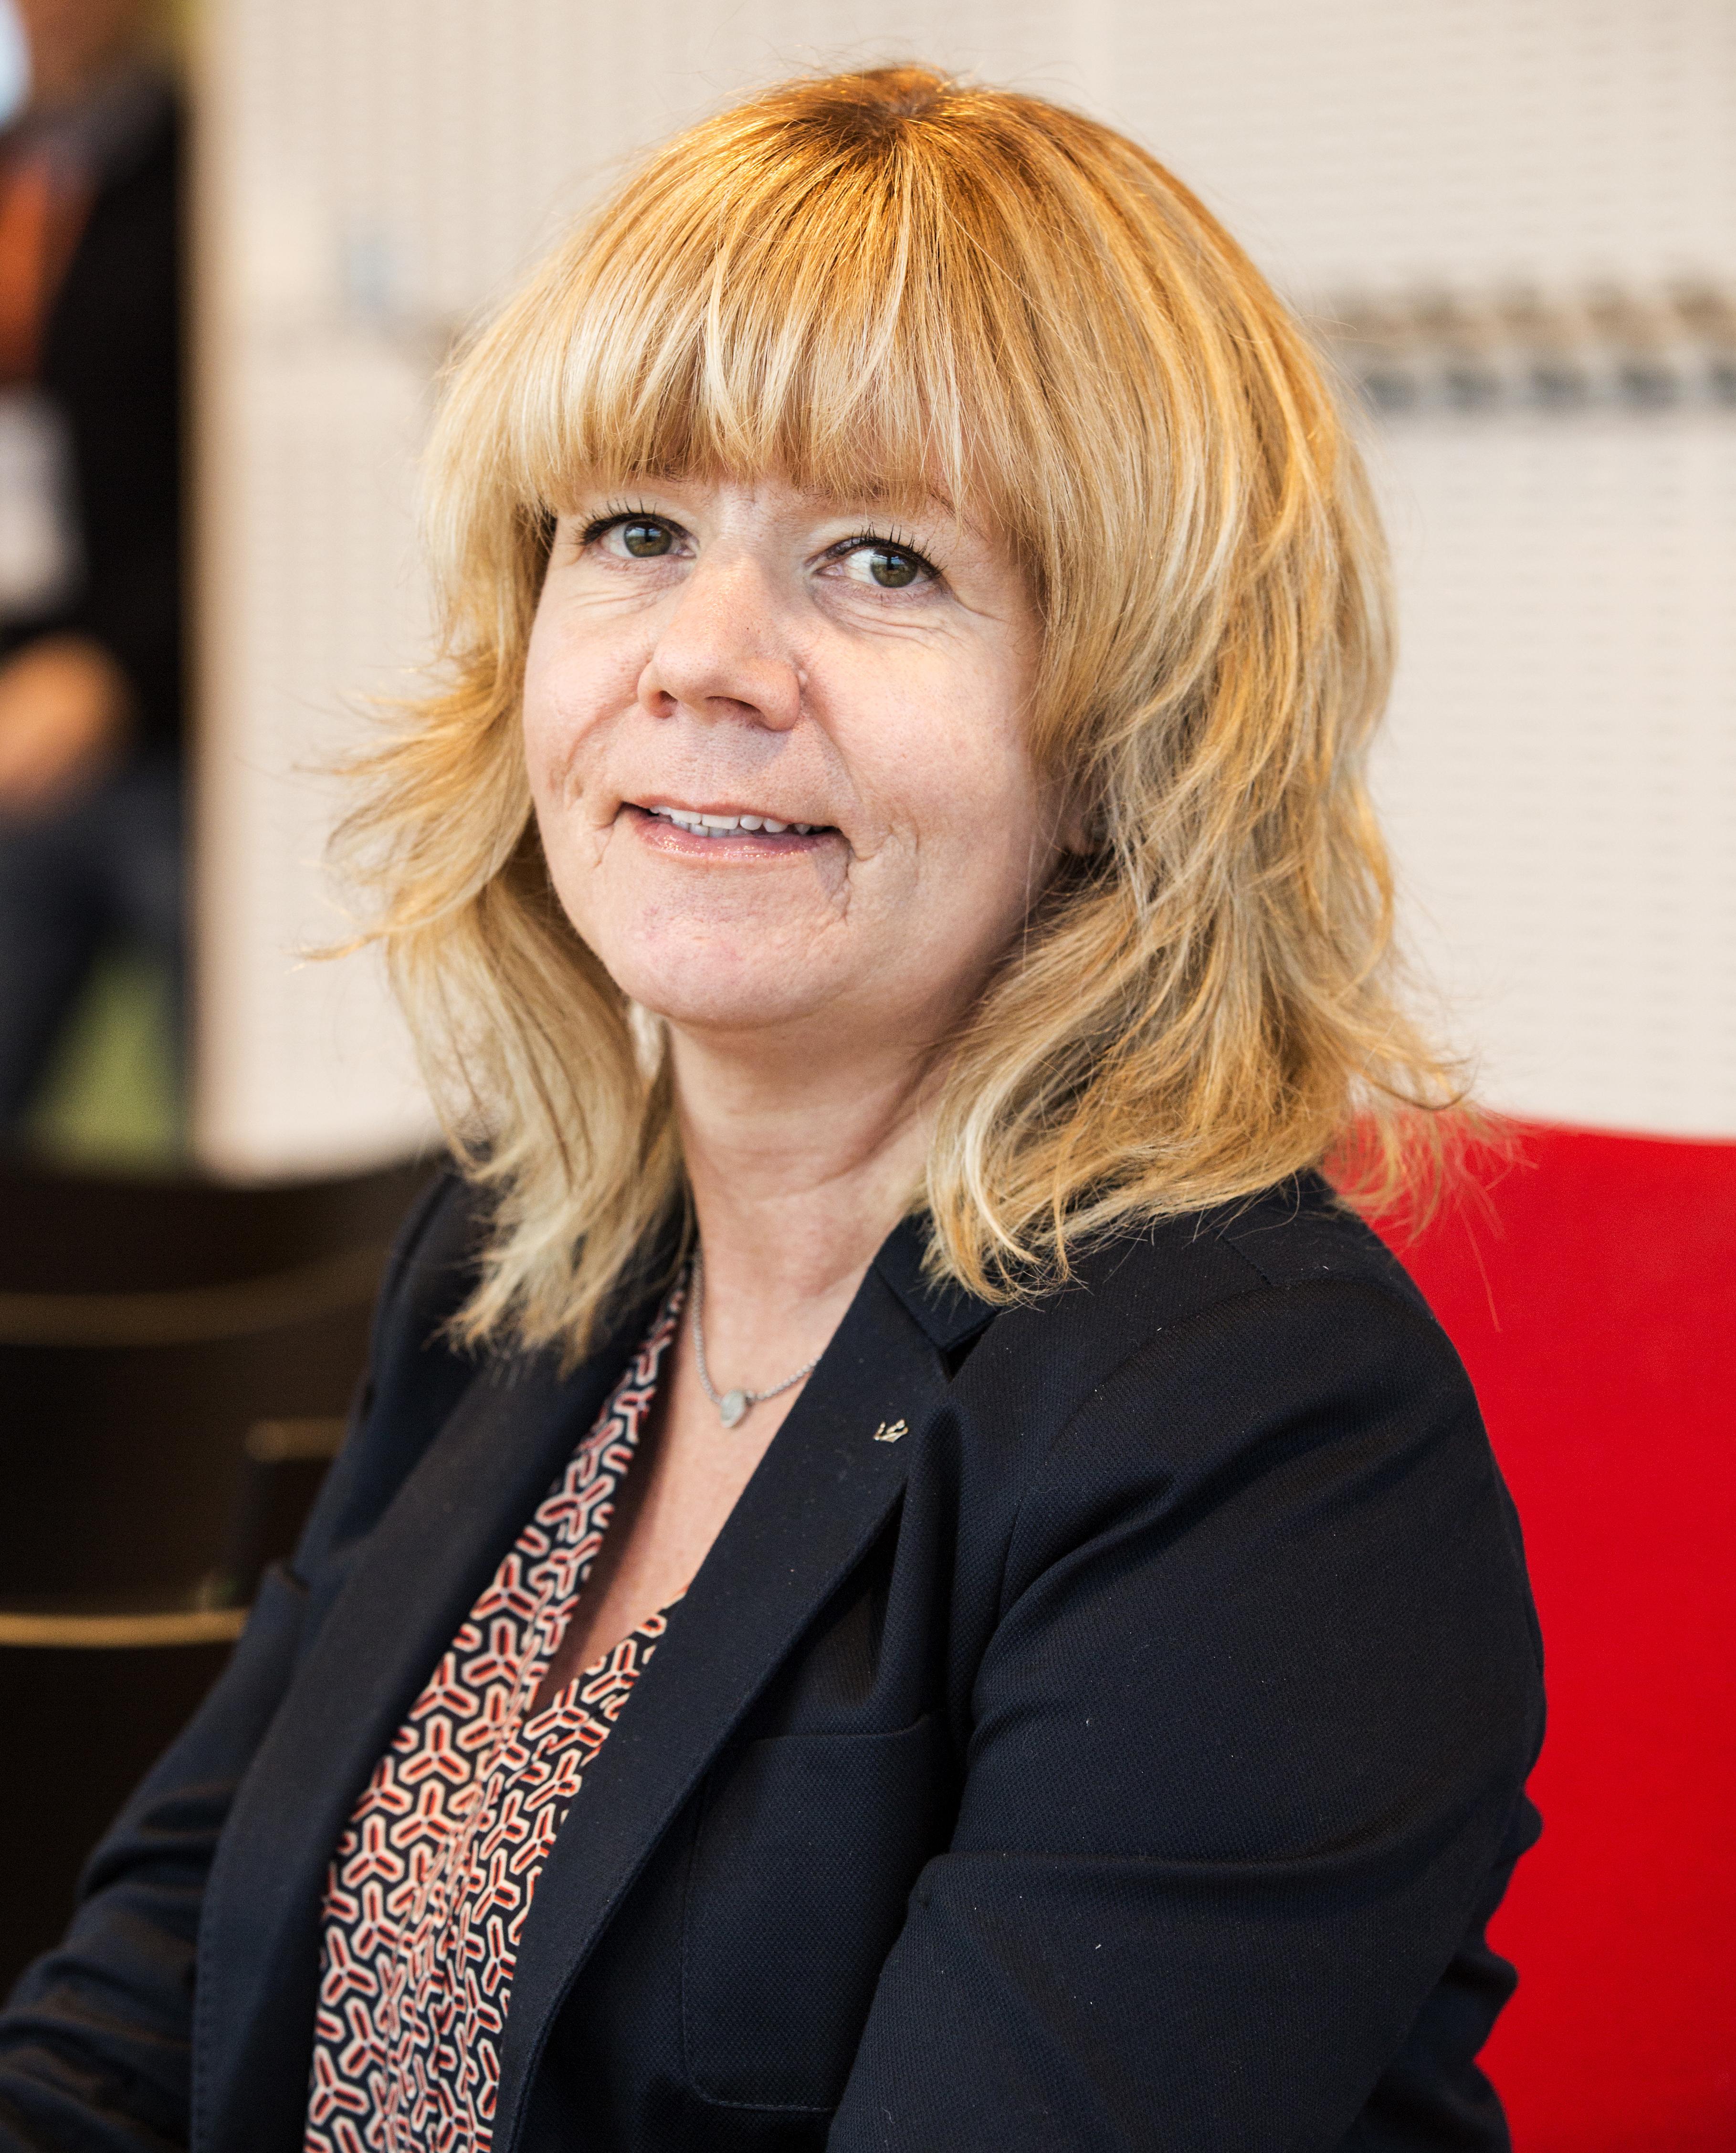 Linda Lundberg-Nilsson